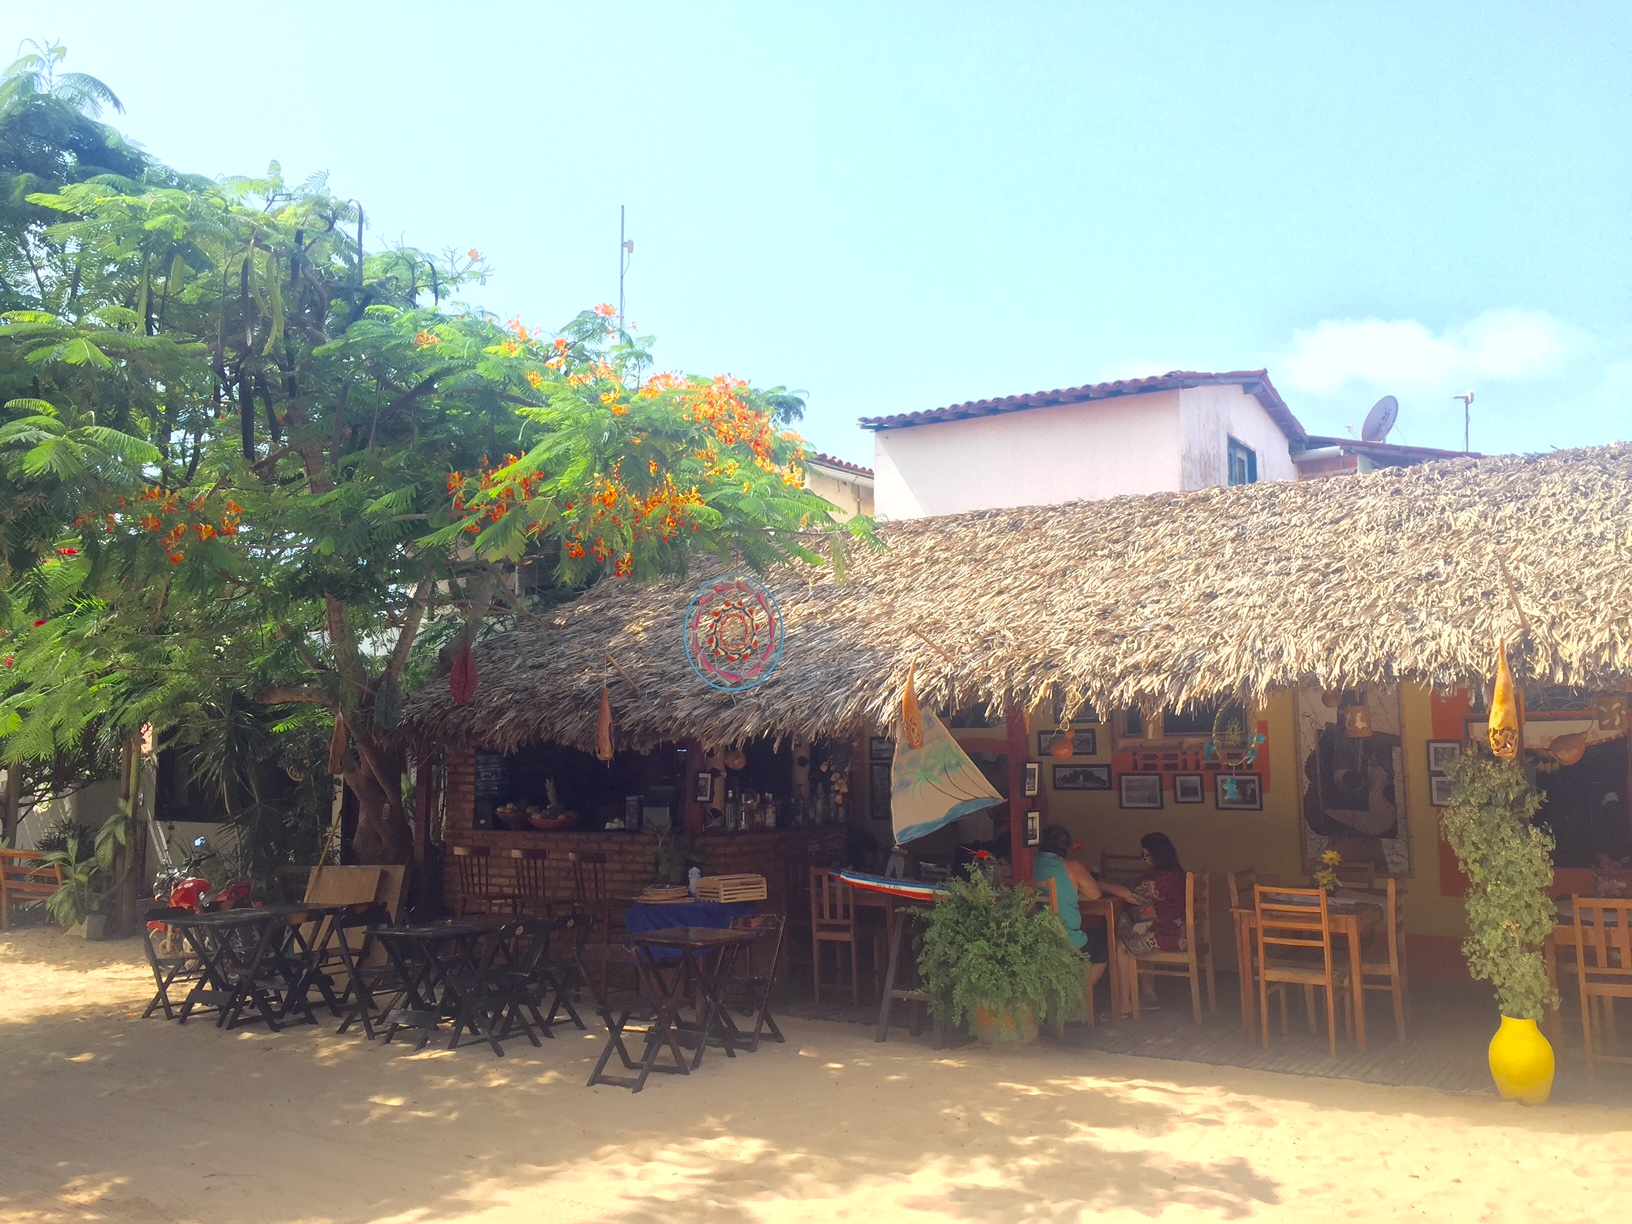 strade di sabbia-jericoacoara